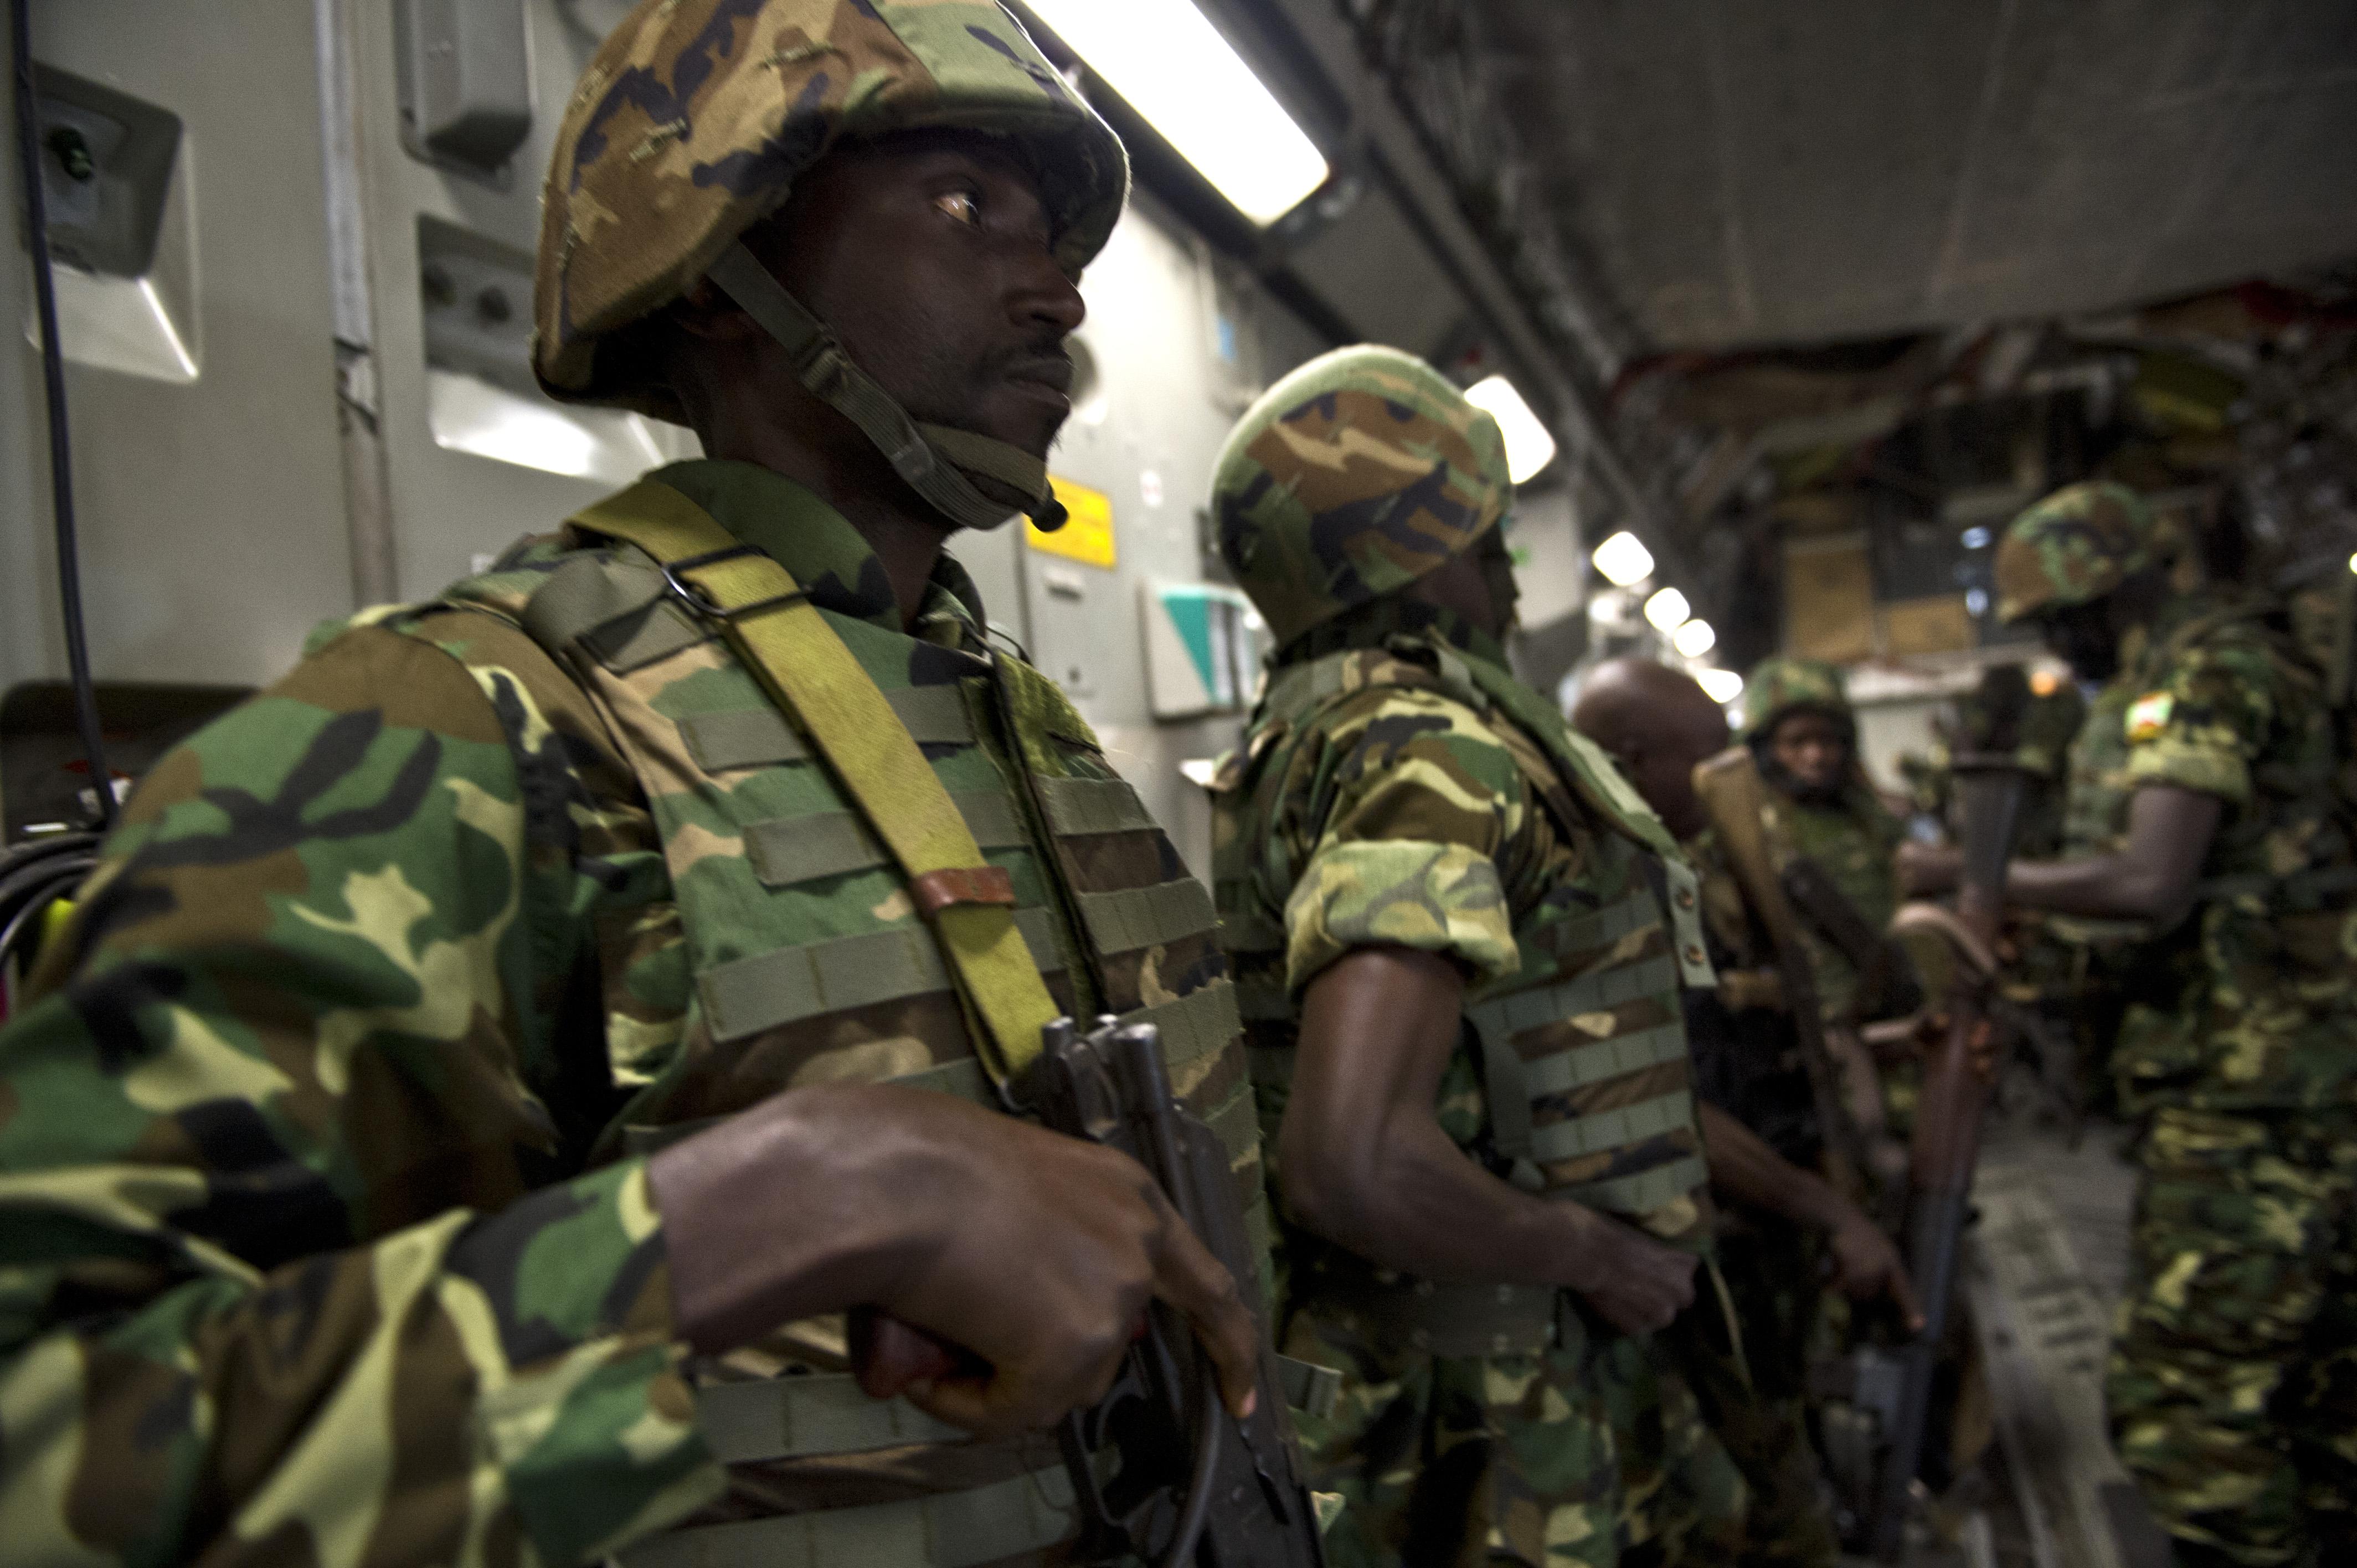 Forces armées du Burundi / National Defence Force of Burundi Burundian_soldiers_prepare_to_exit_a_U.S._Air_Force_C-17_Globemaster_III_aircraft_at_Bangui_M'Poko_International_Airport_in_Bangui,_Central_African_Republic,_Dec._13,_2013_131213-F-YM869-405